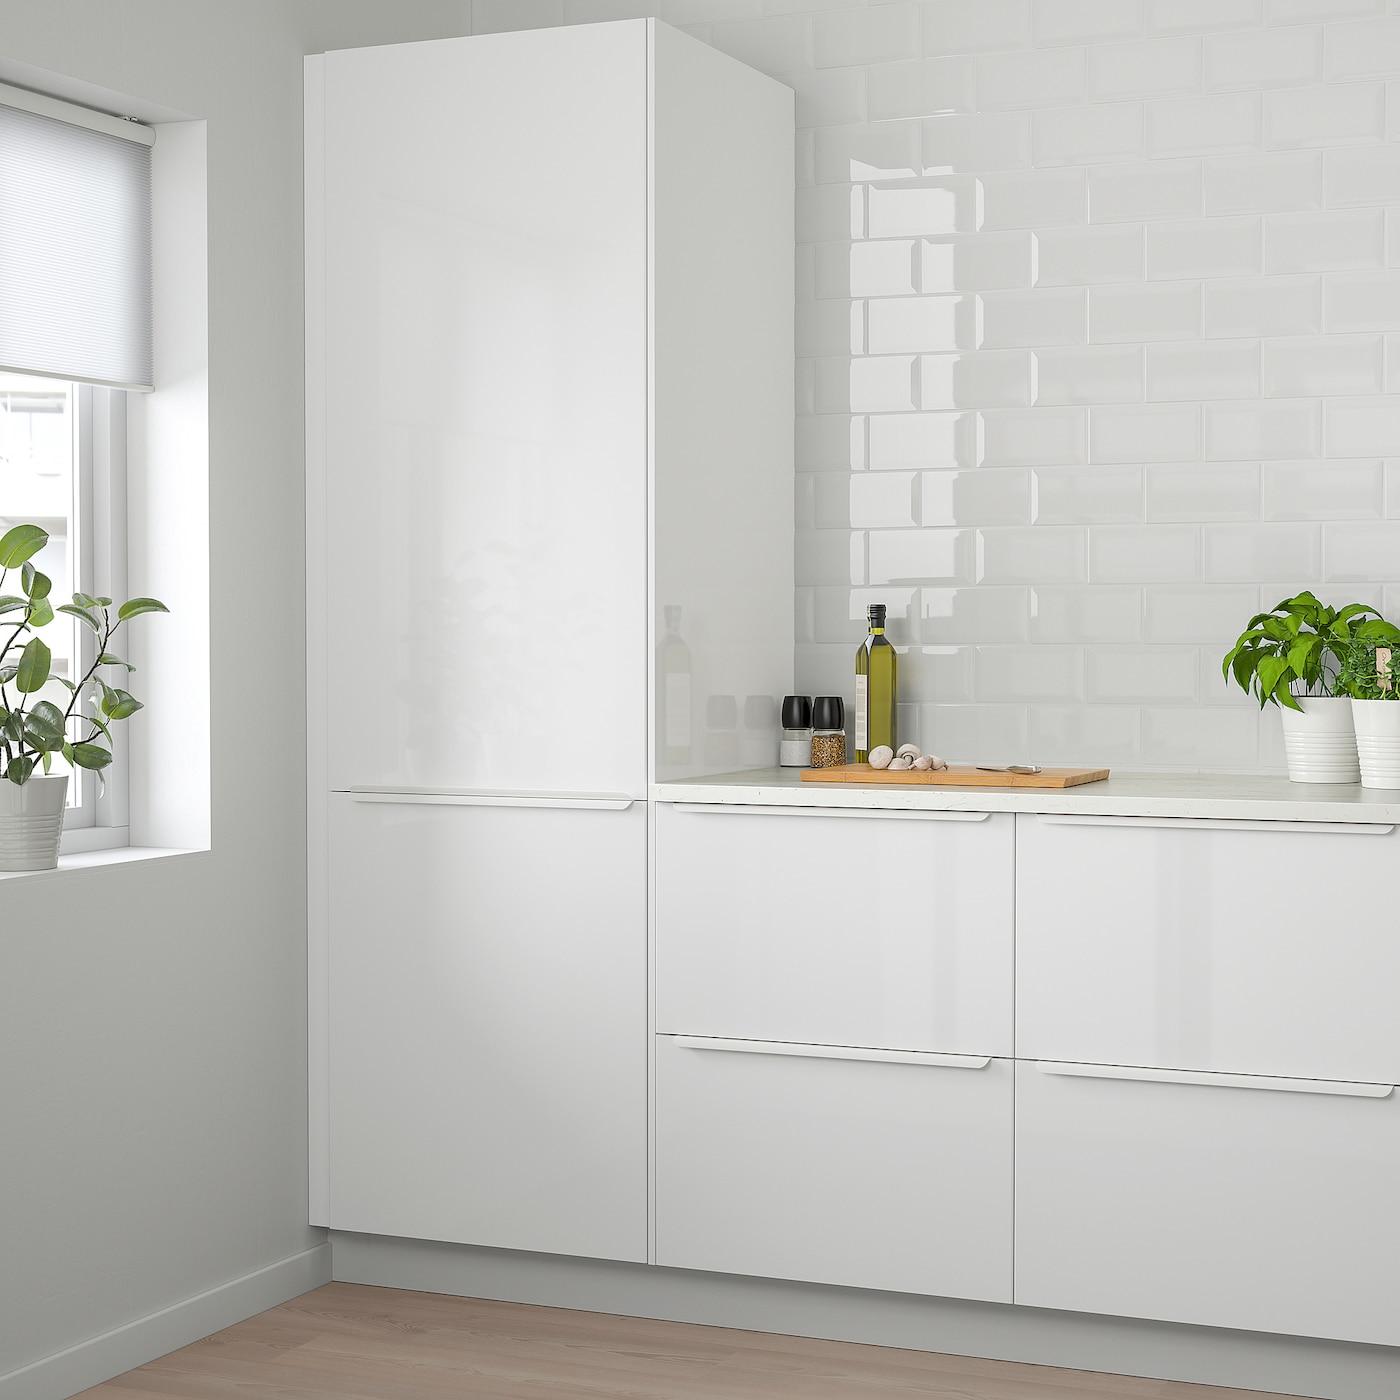 Ringhult Door High Gloss White 24x60 61x152 Cm Ikea